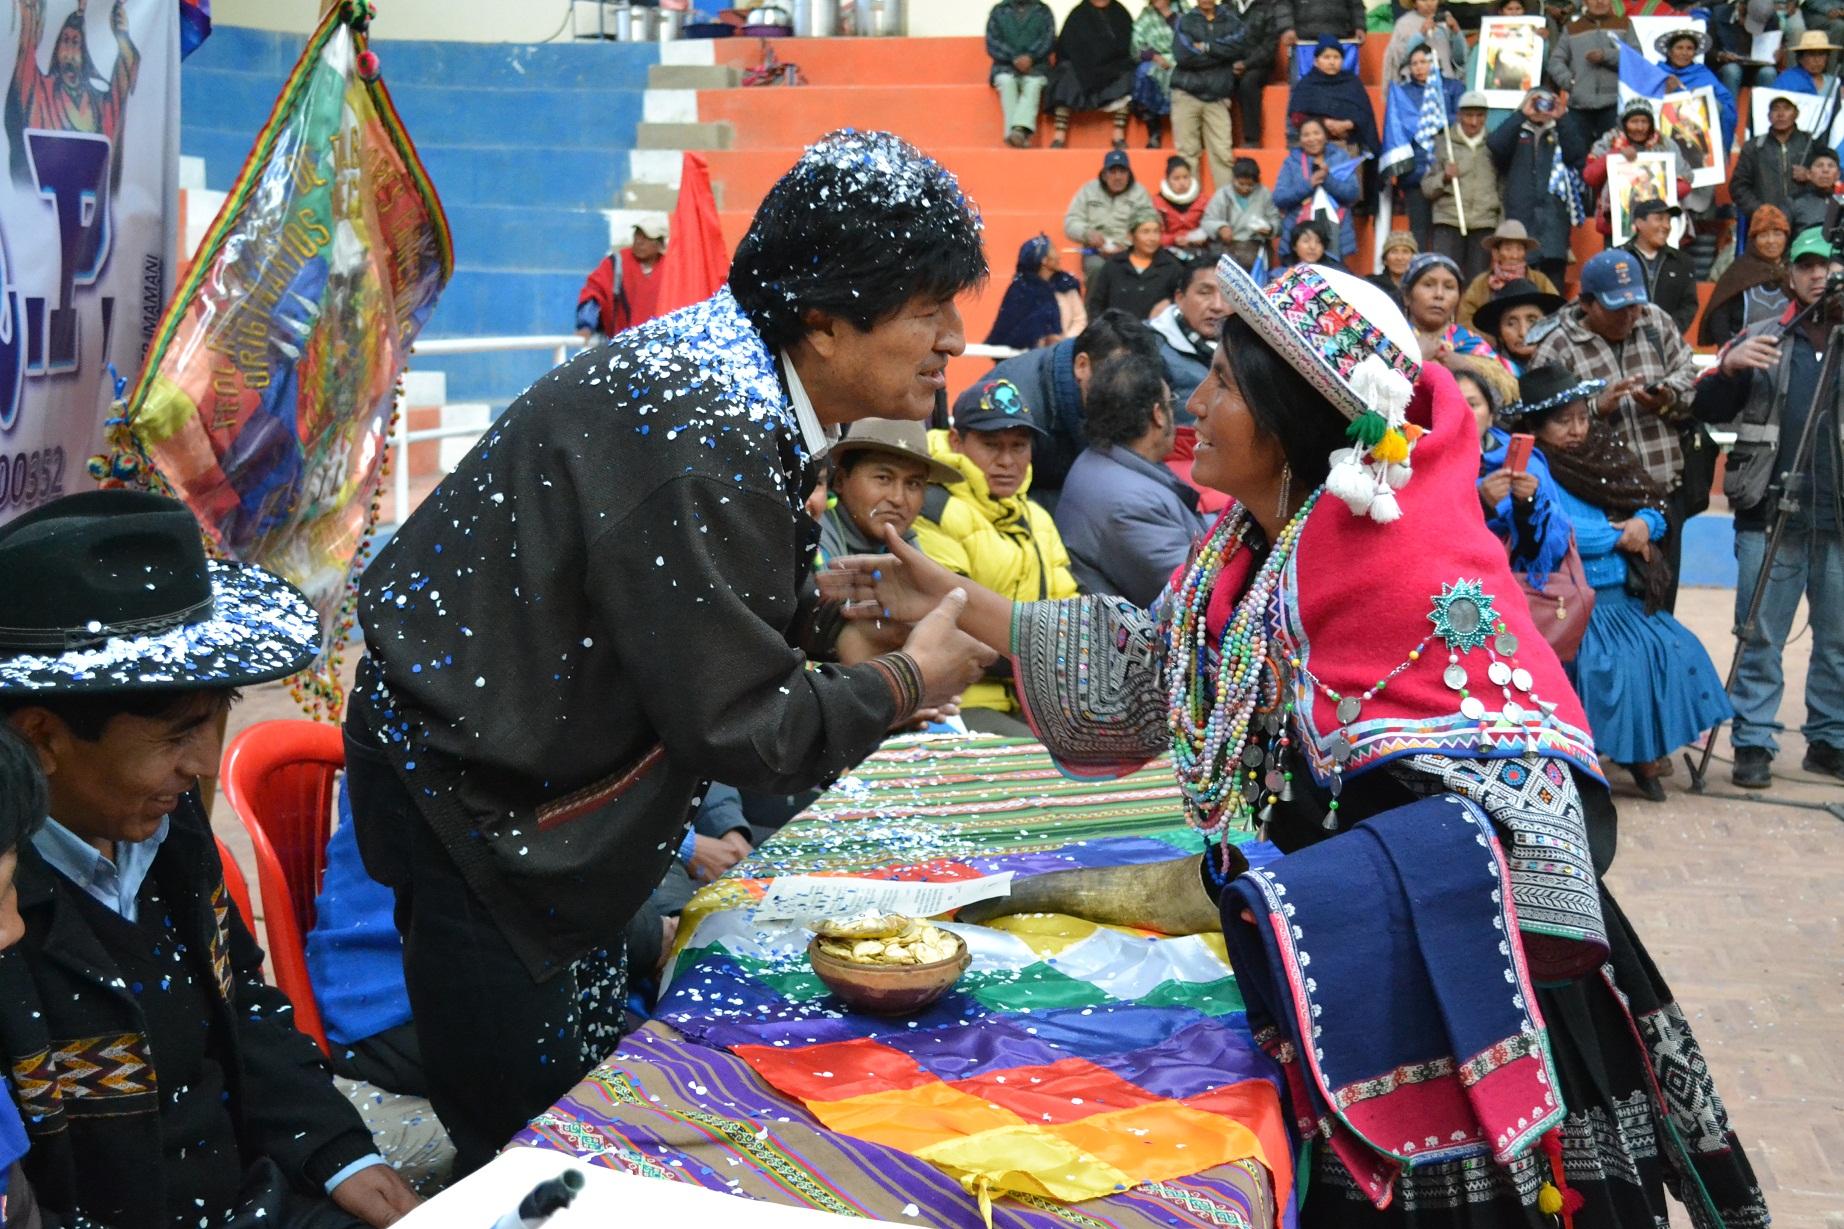 En el Trópico de Cochabamba esperan el regreso de Evo Morales Por Sebastián Ochoa   Sputnik, Rusia